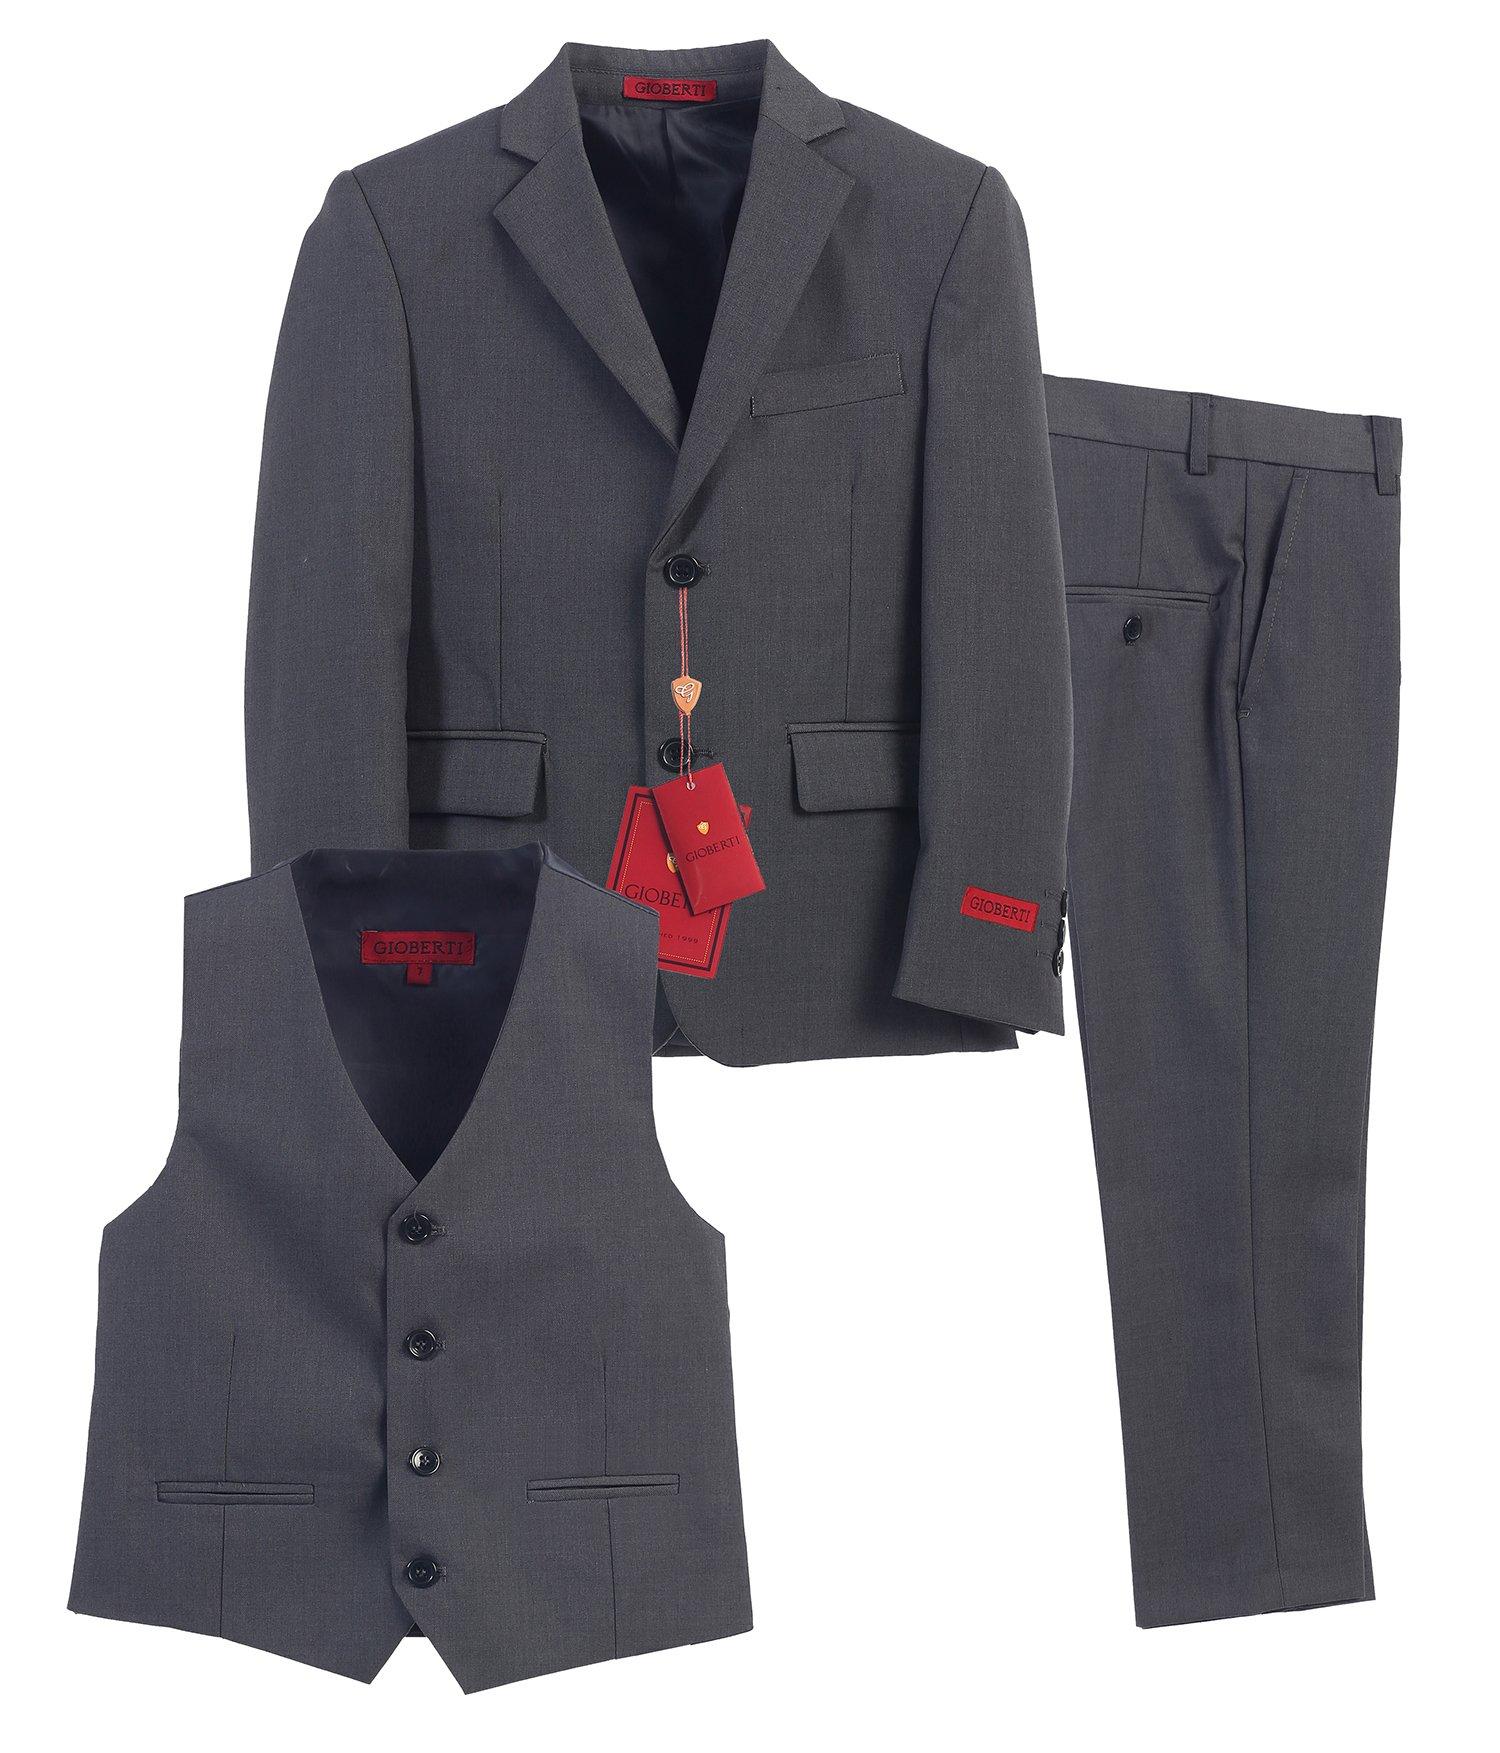 Gioberti Boy's Formal 3 Piece Suit Set, Charcoal, Size 20